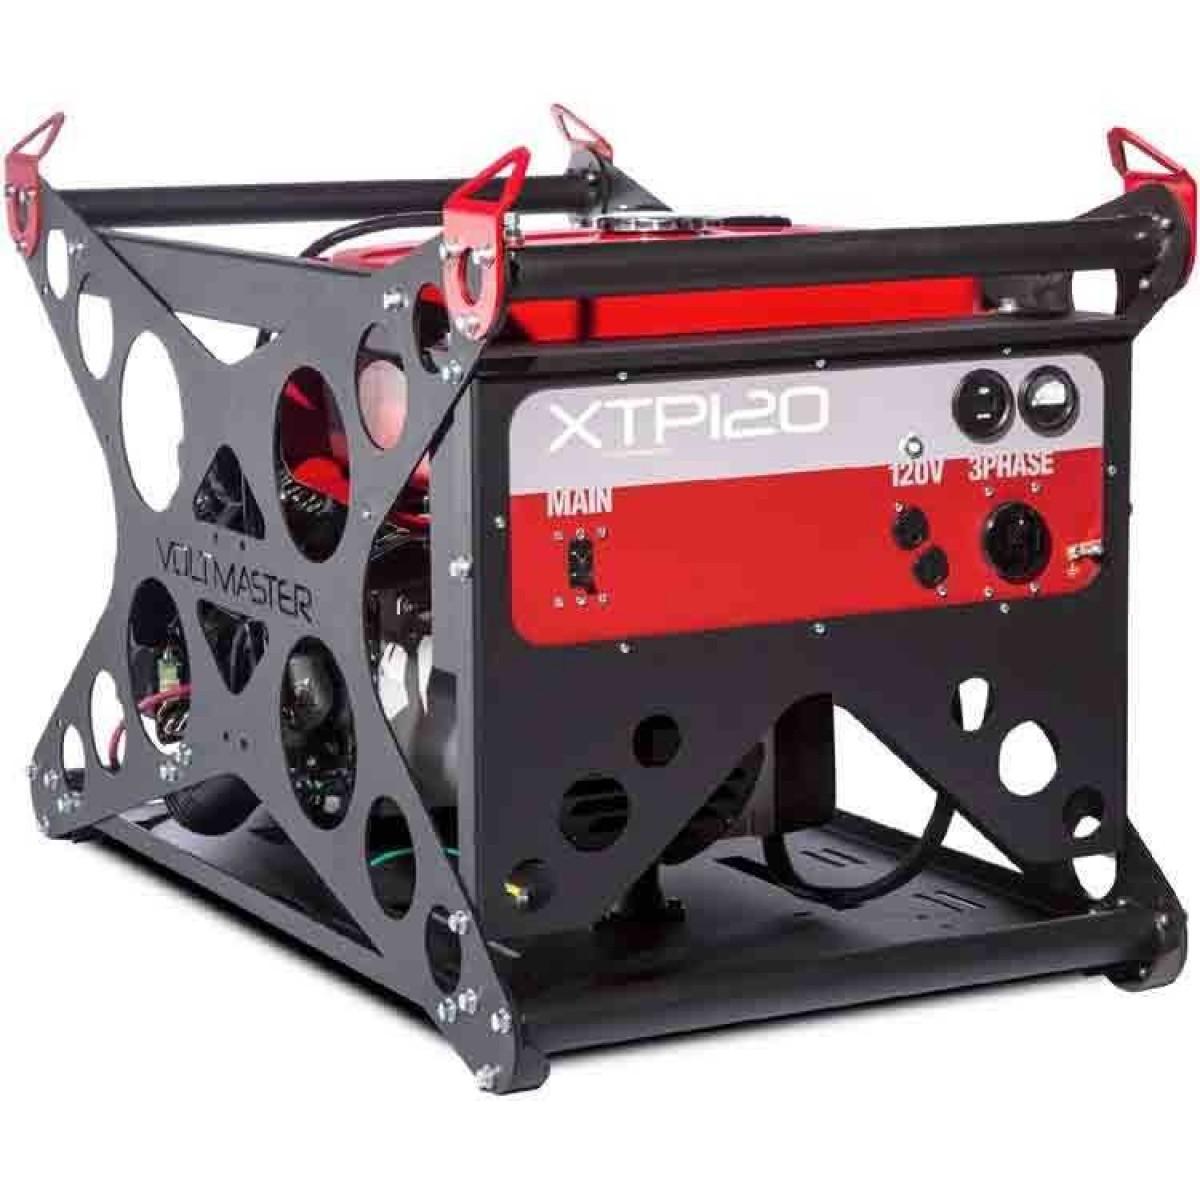 3 Phase Generator >> Voltmaster Xtp120eh208 Honda 12000 Watt Three Phase Generator